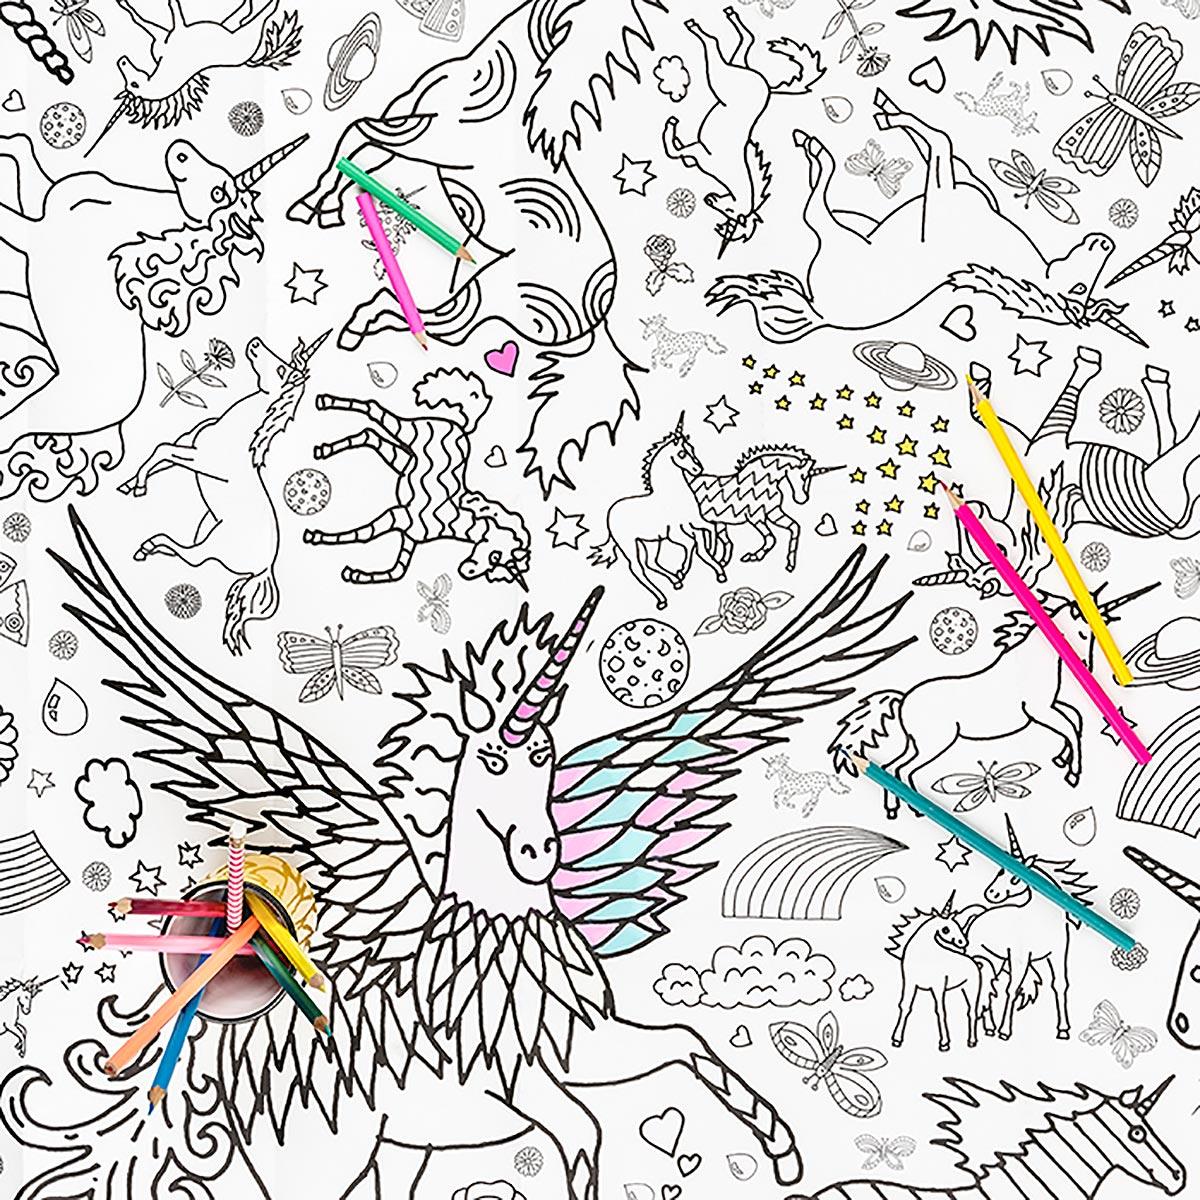 picture of unicorns to colour in